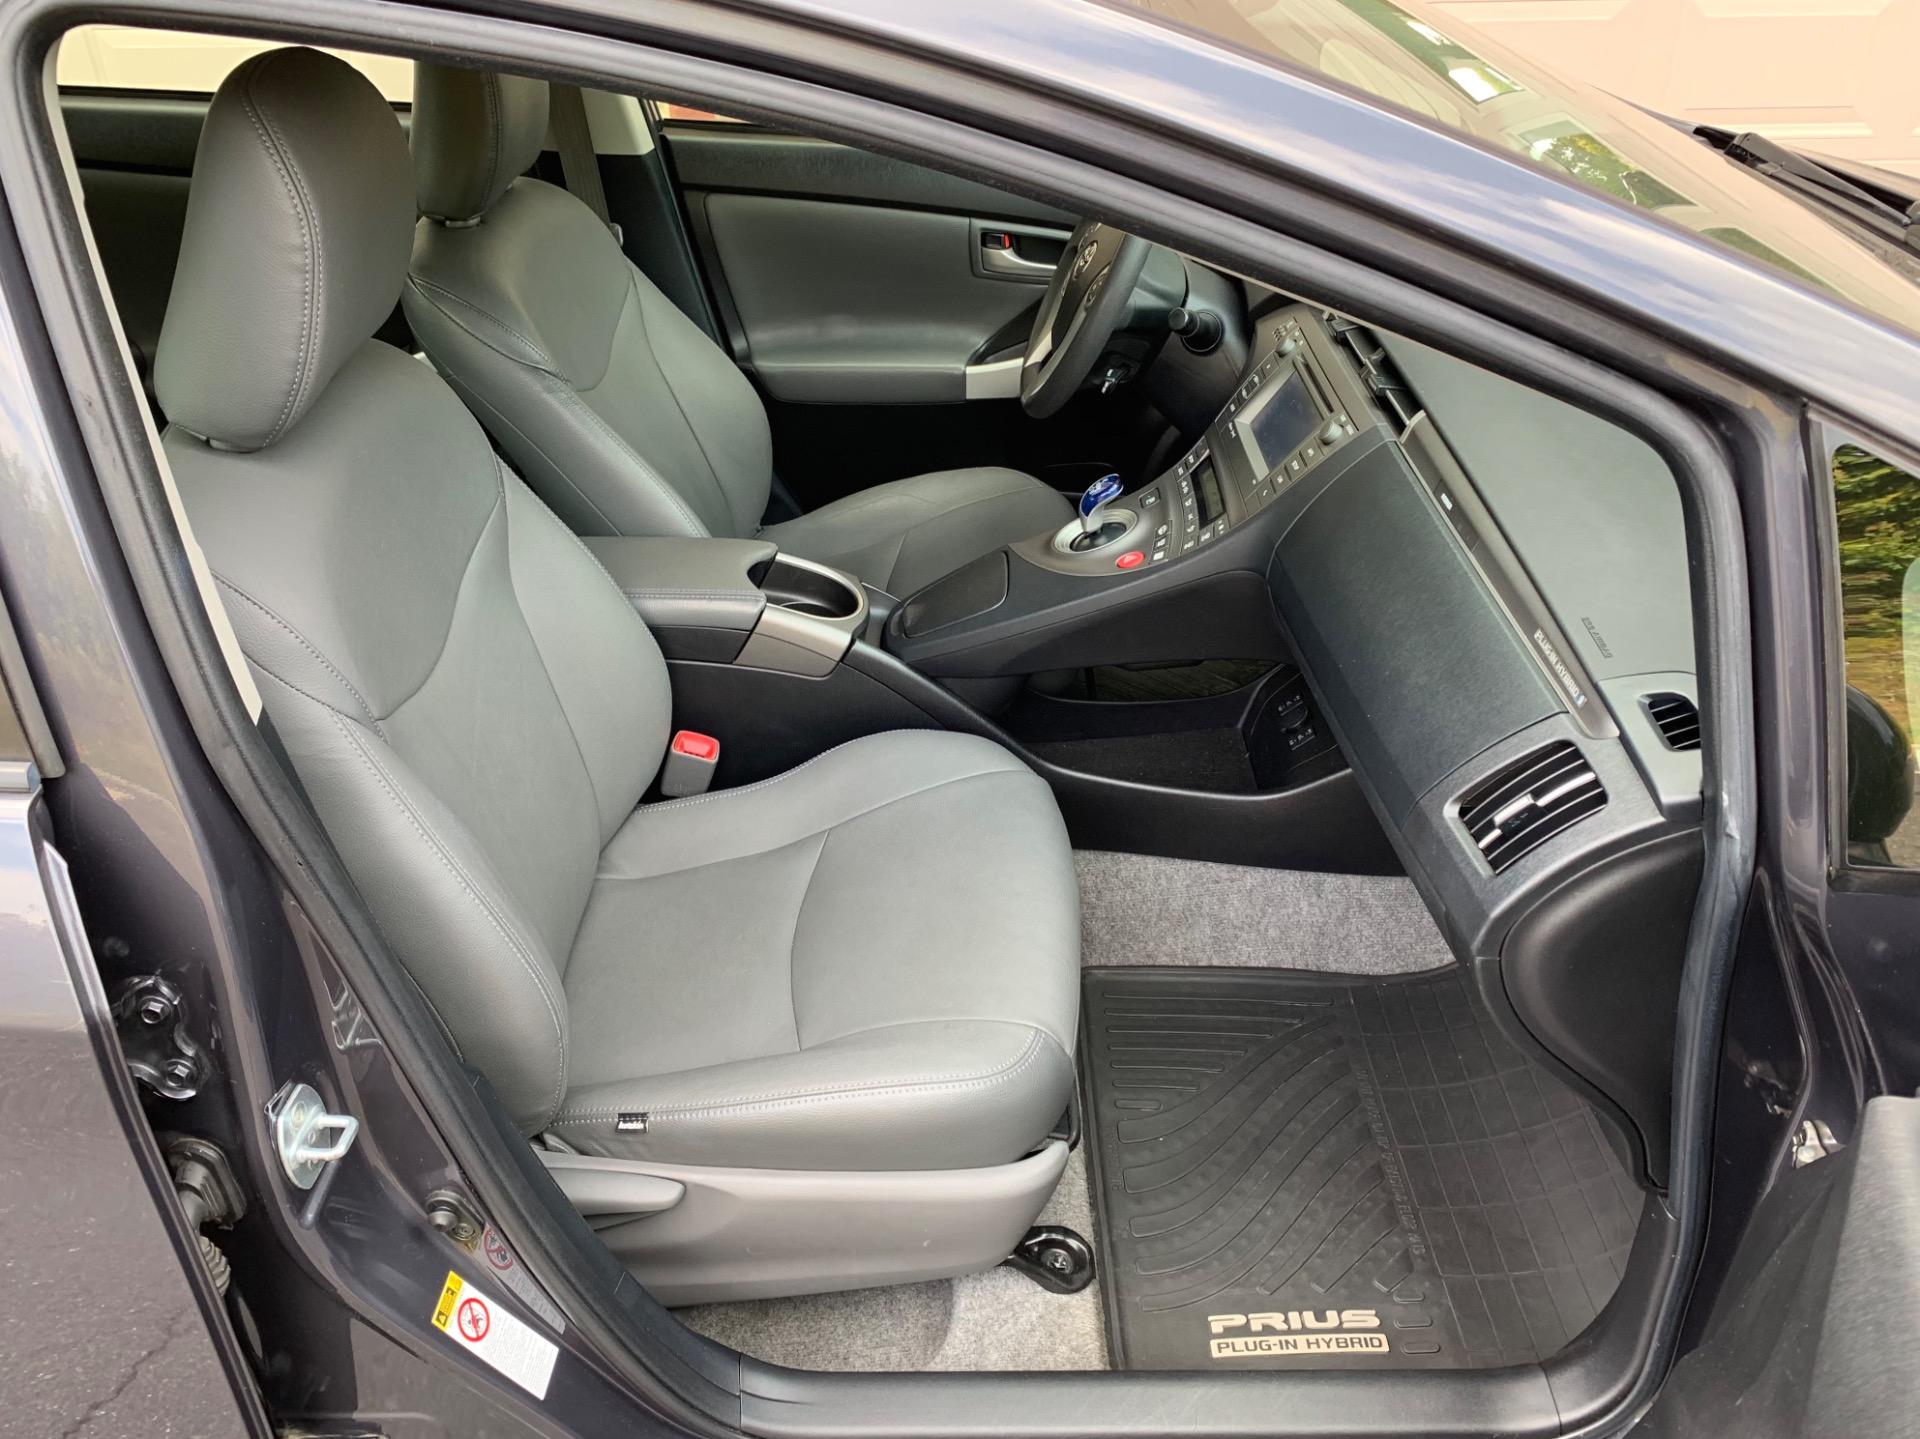 Used-2012-Toyota-Prius-Plug-in-Hybrid